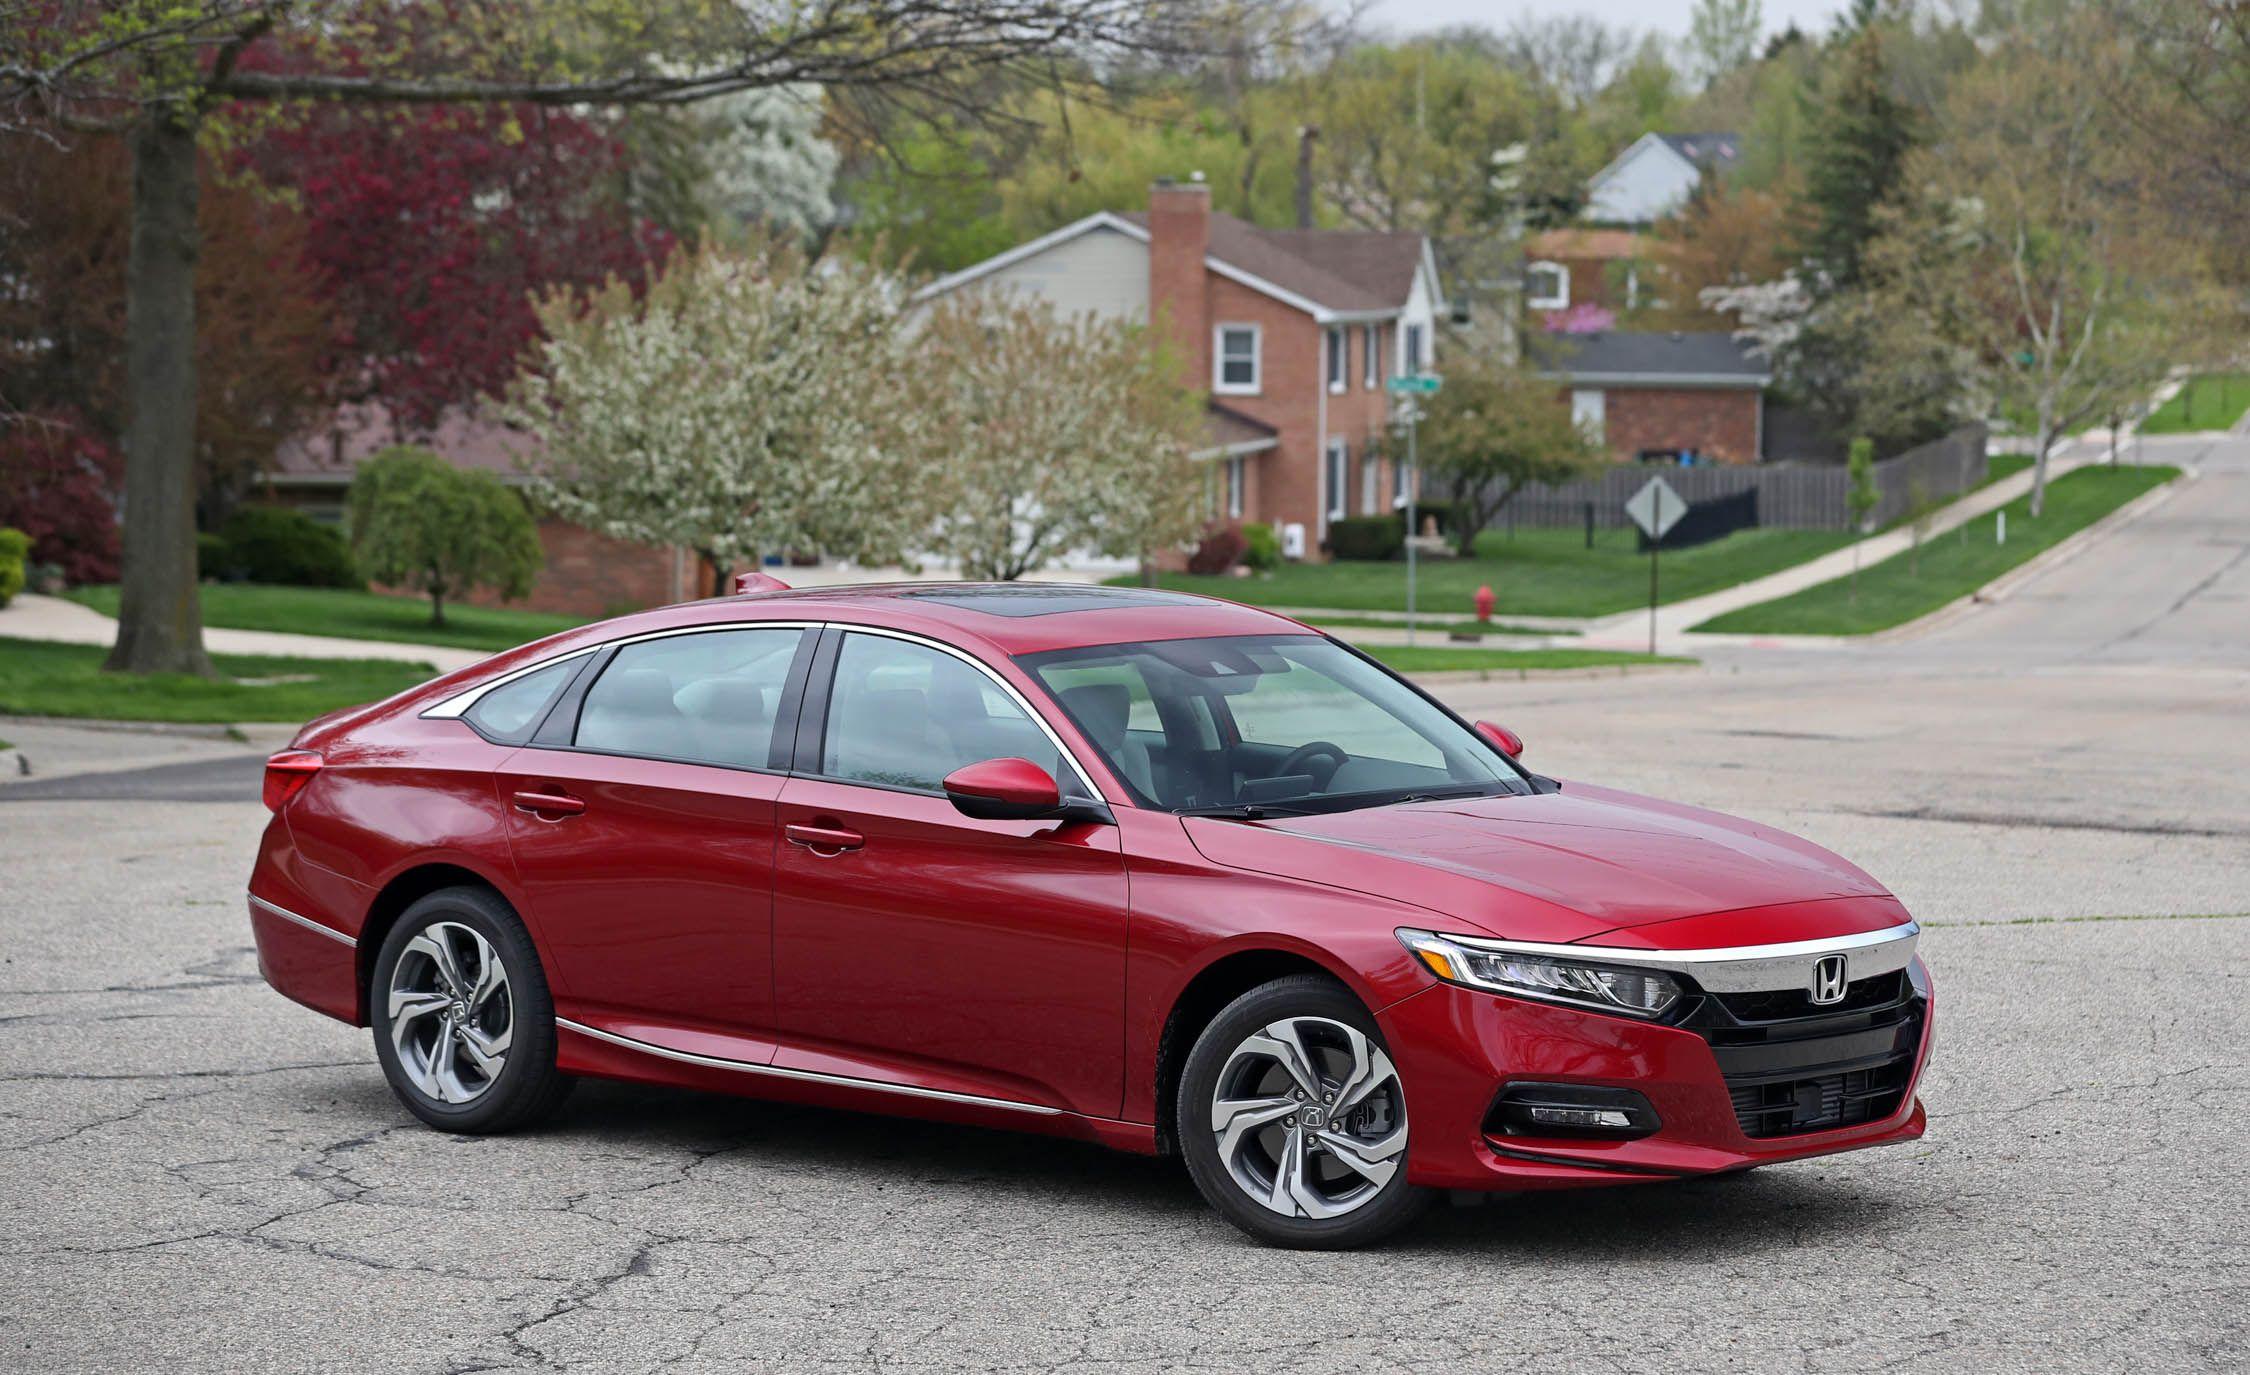 2019 Honda Accord Price Rises Slightly Mid Size Sedan Pricing Release Date